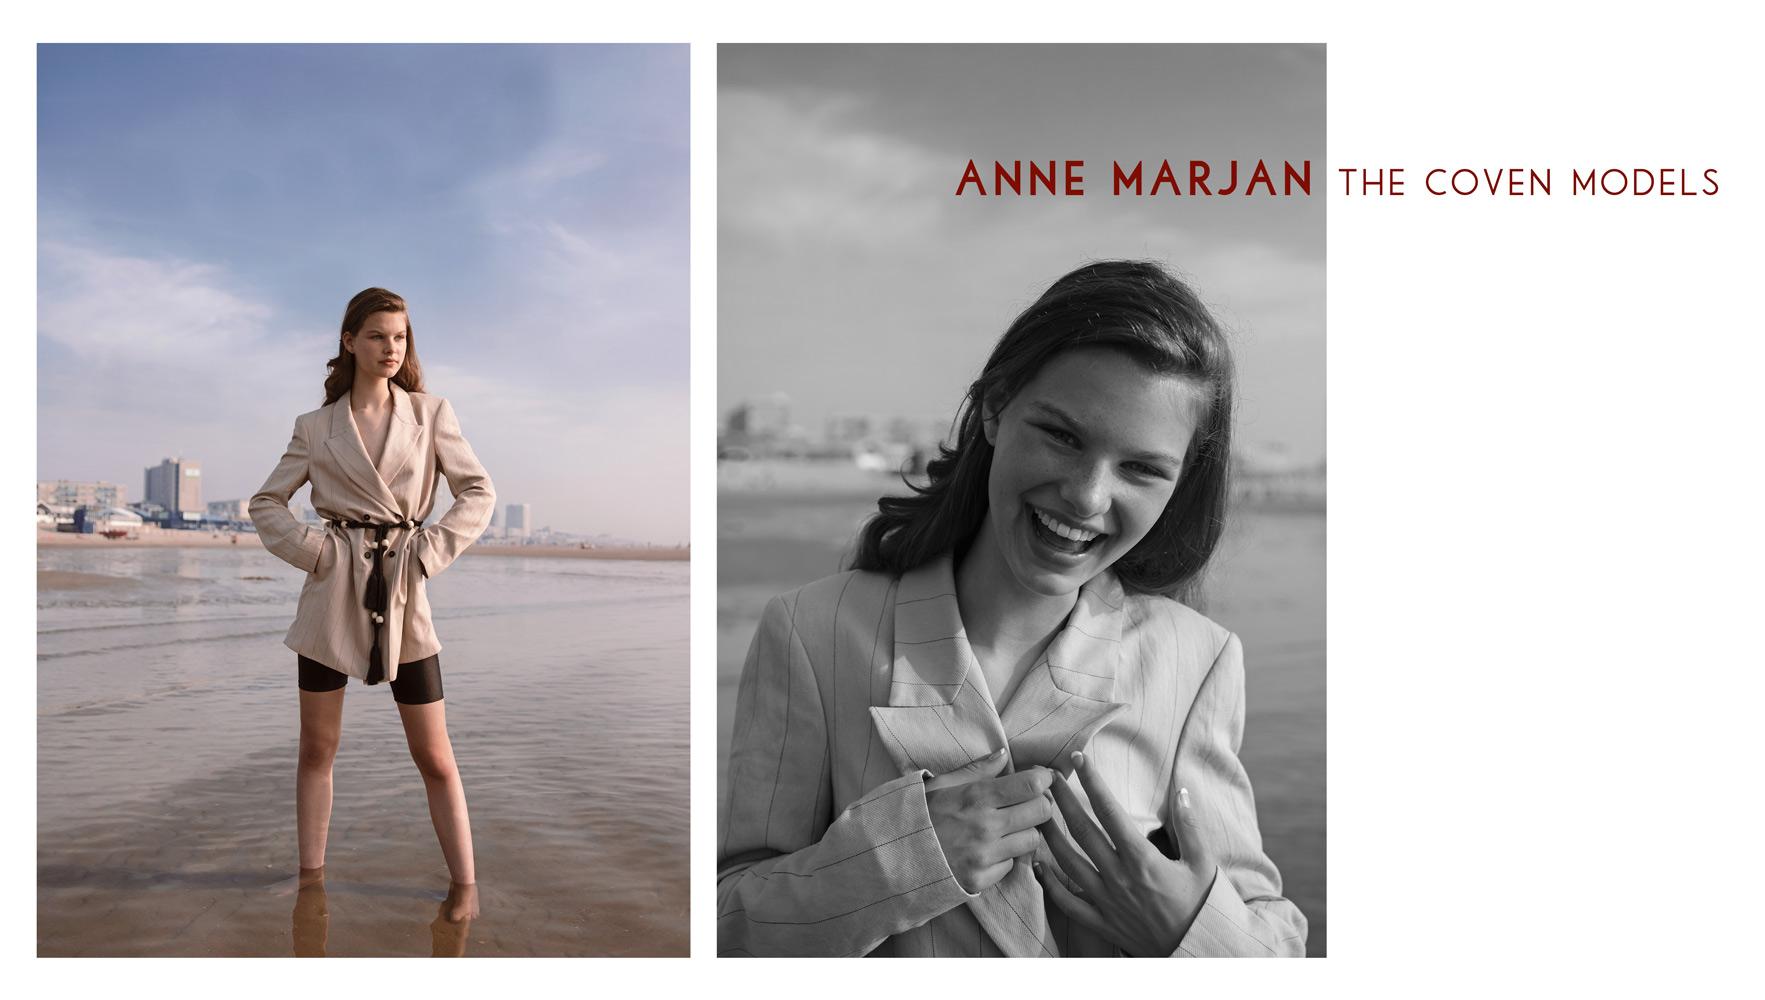 Anne Marjan – The Coven Models